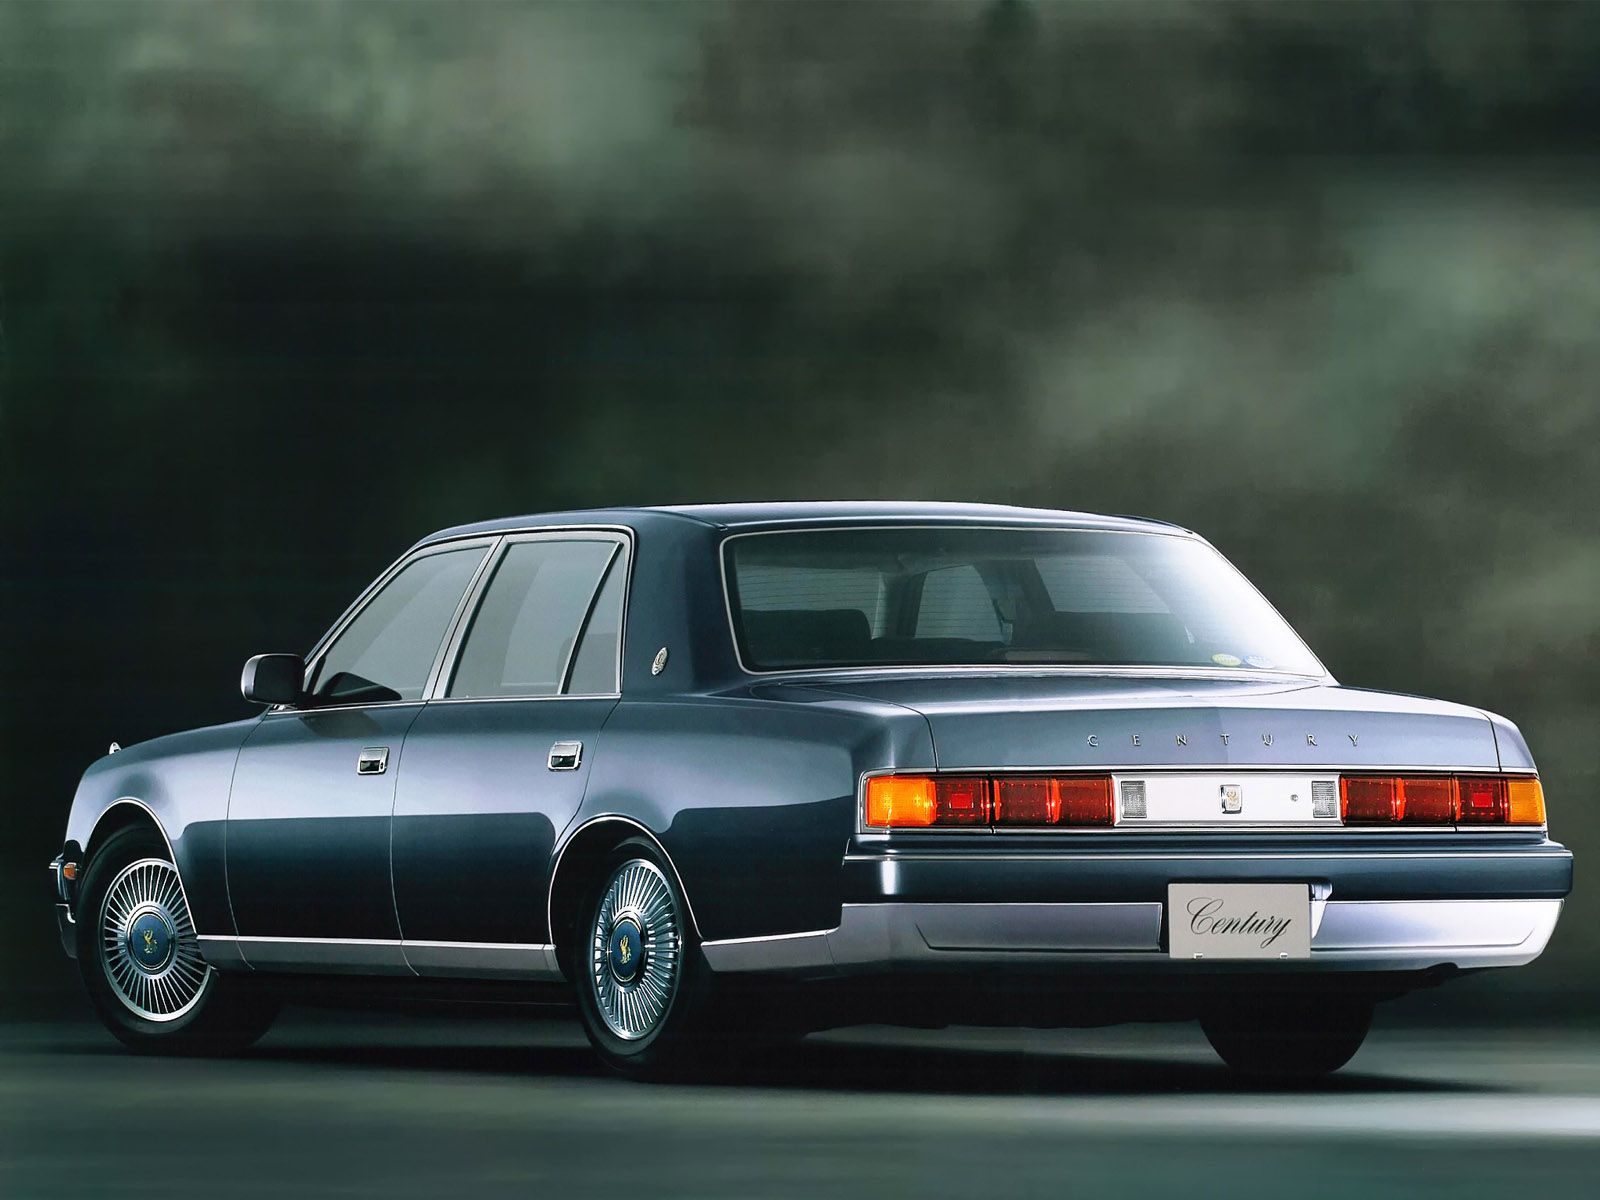 1997 Toyota Century Gzg50 Japanische Autos Autos Transporter